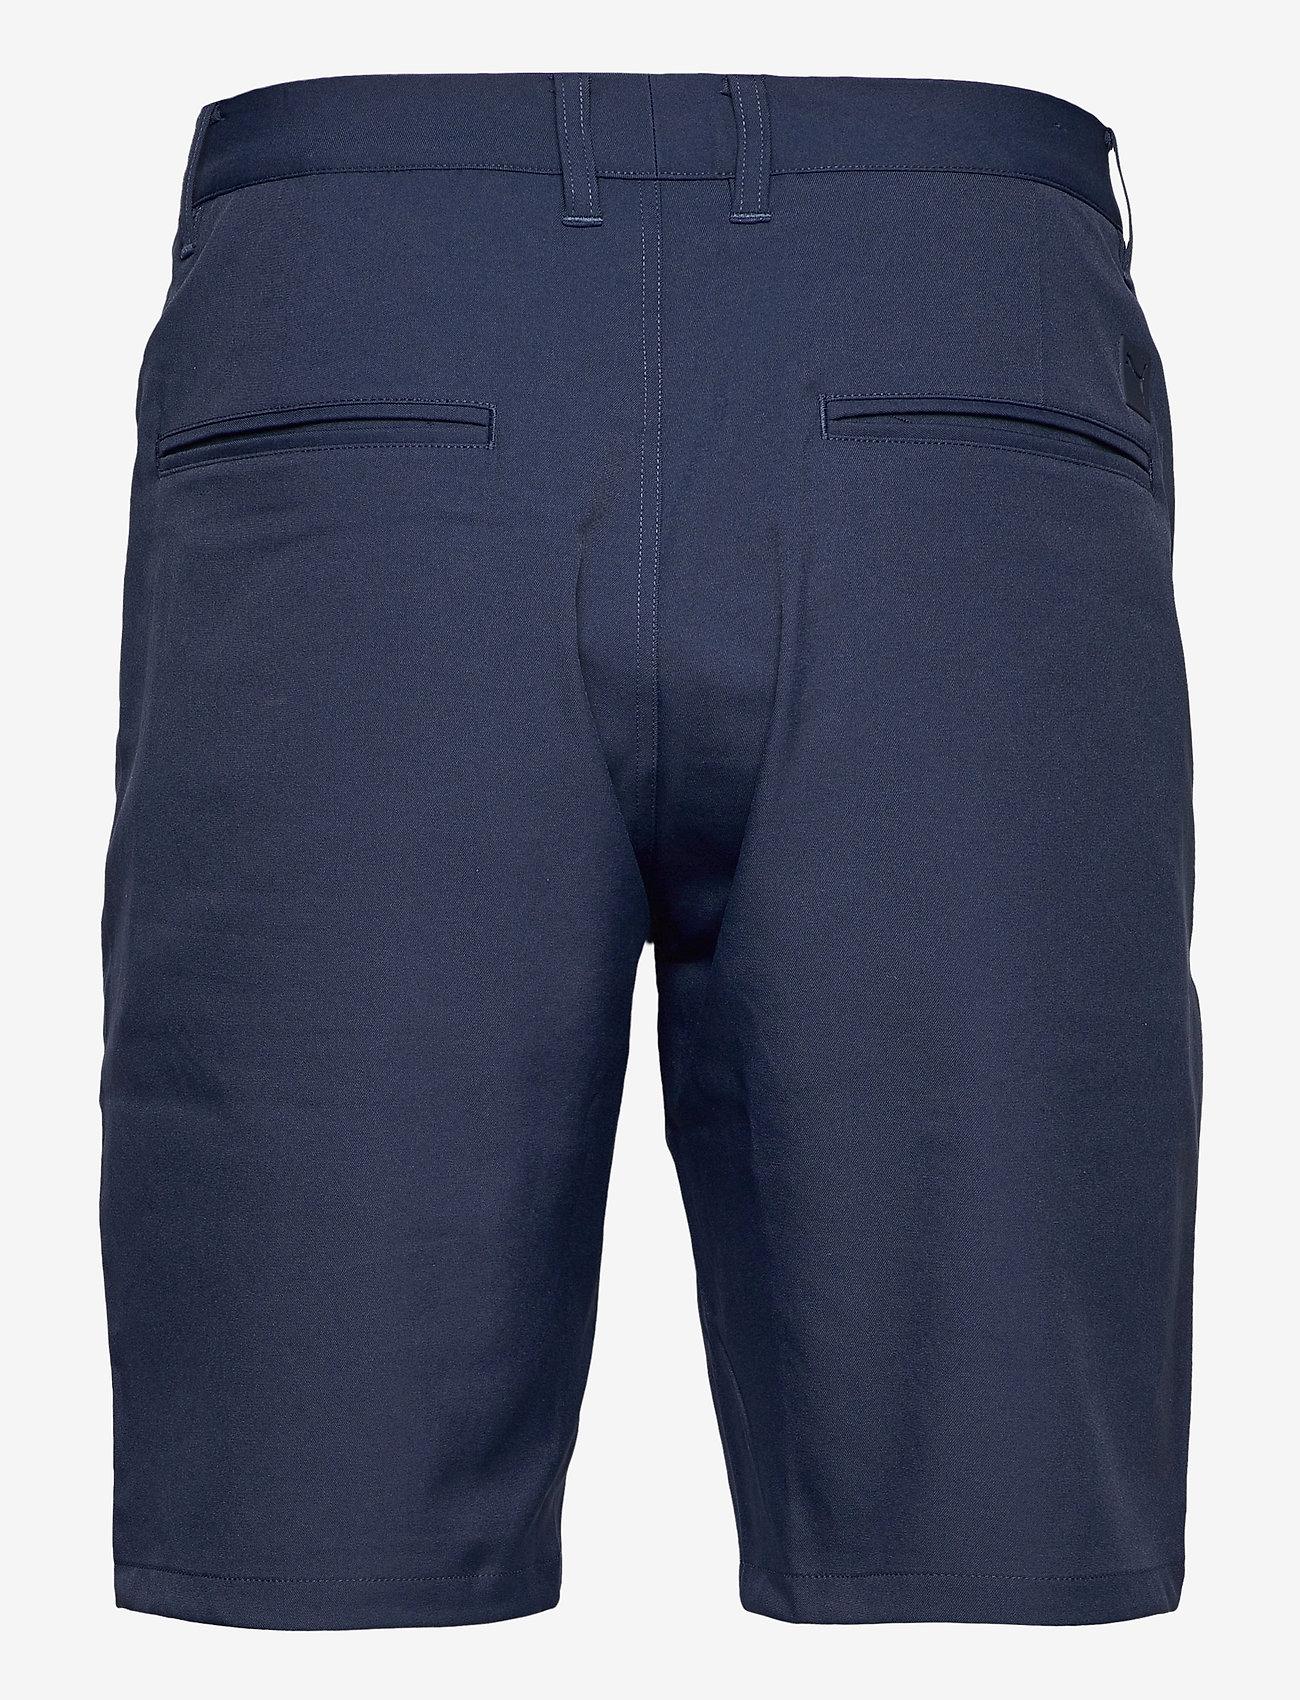 PUMA Golf - Jackpot Short - golf shorts - navy blazer - 1